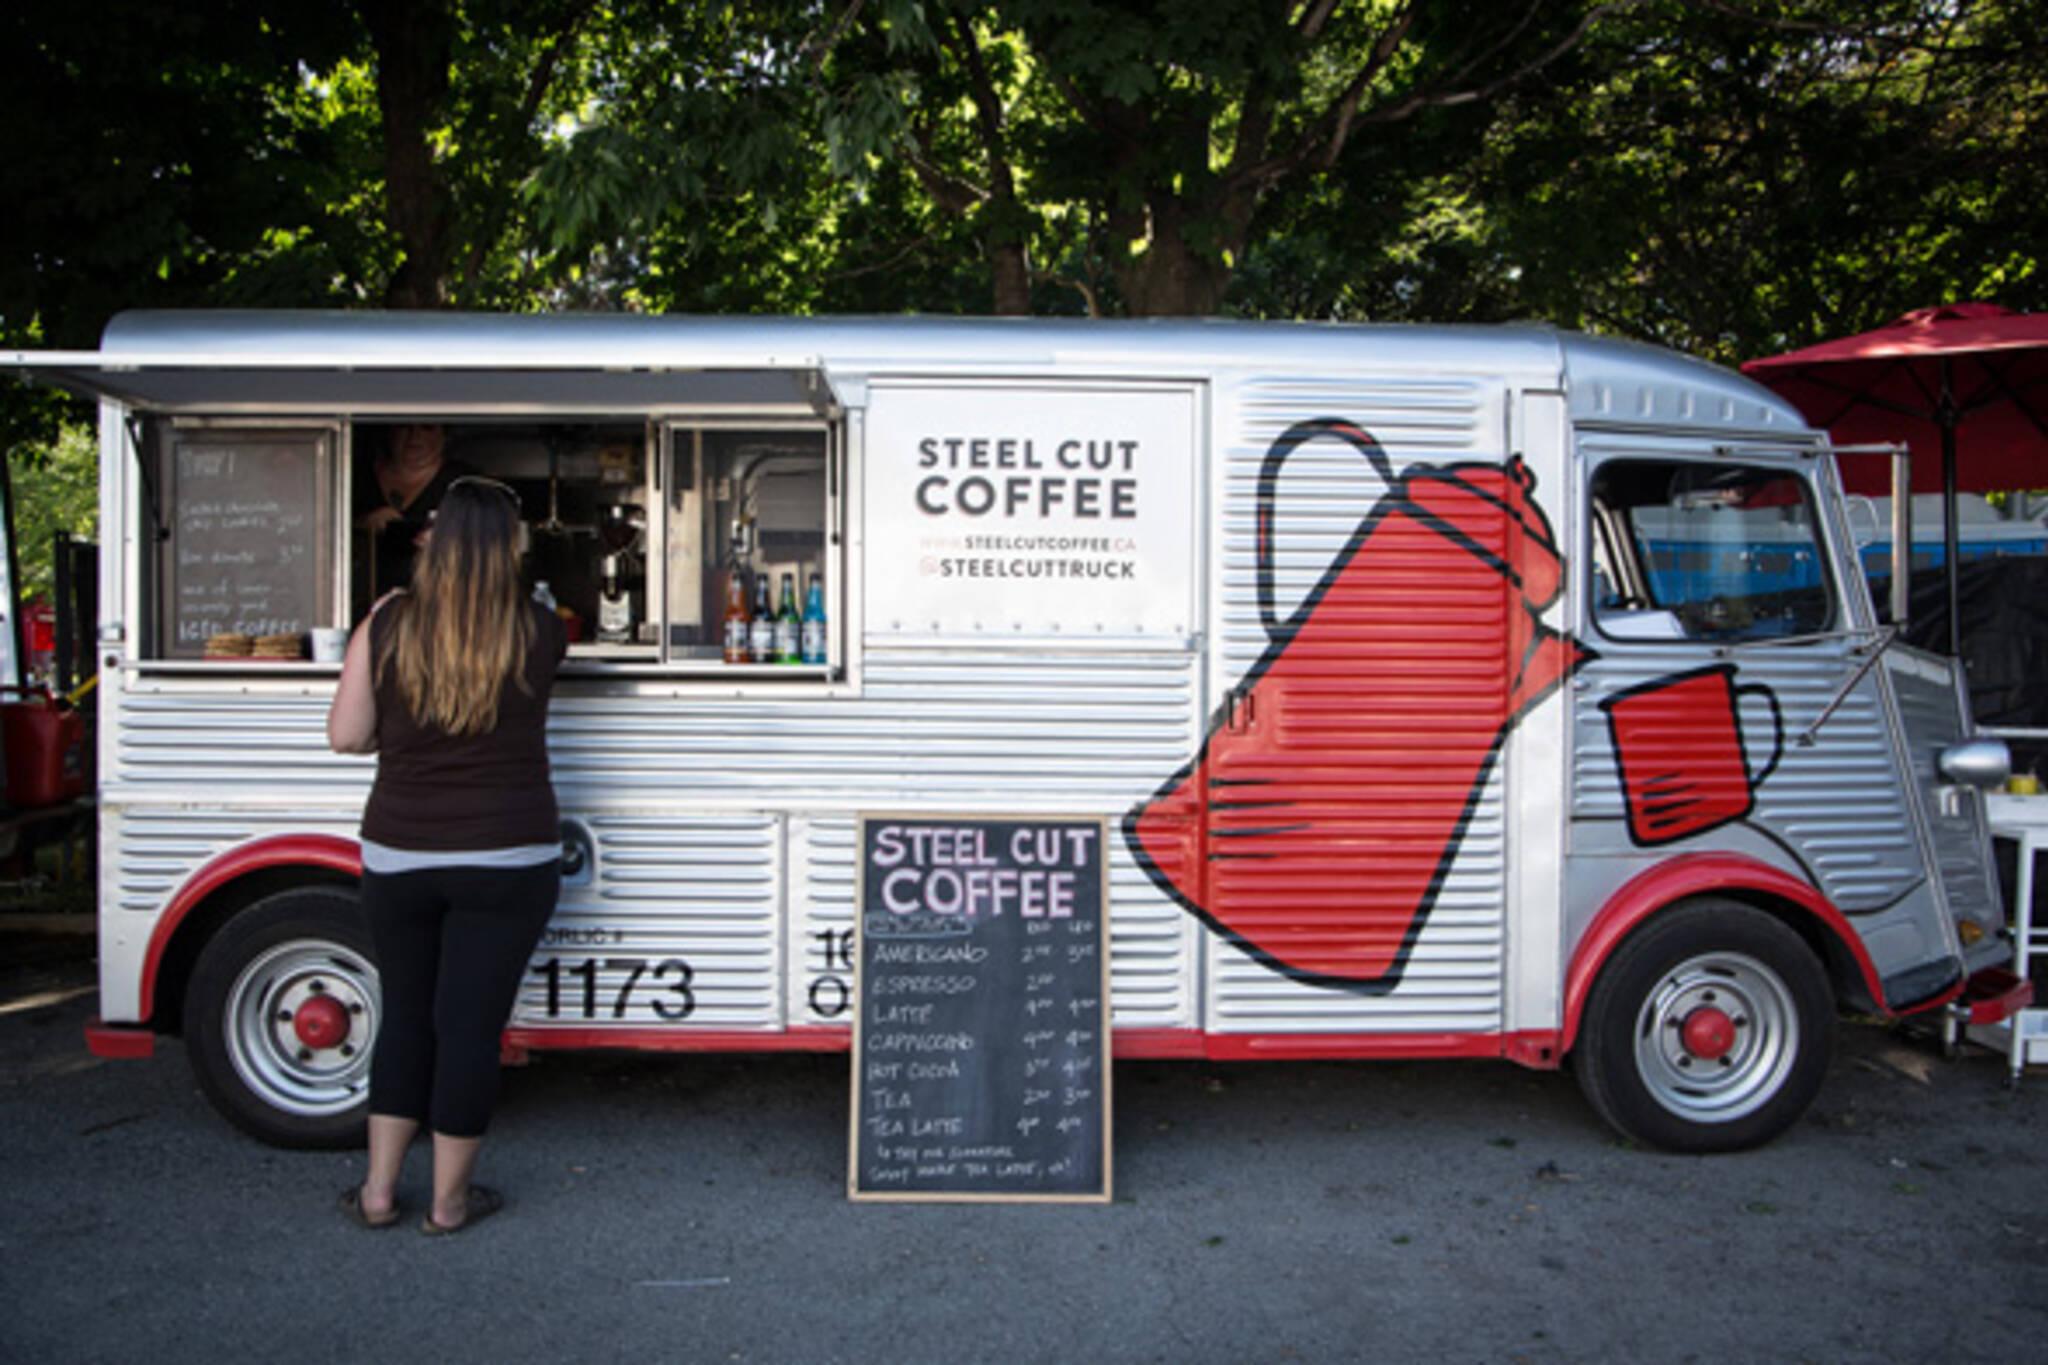 steel cut coffee food truck